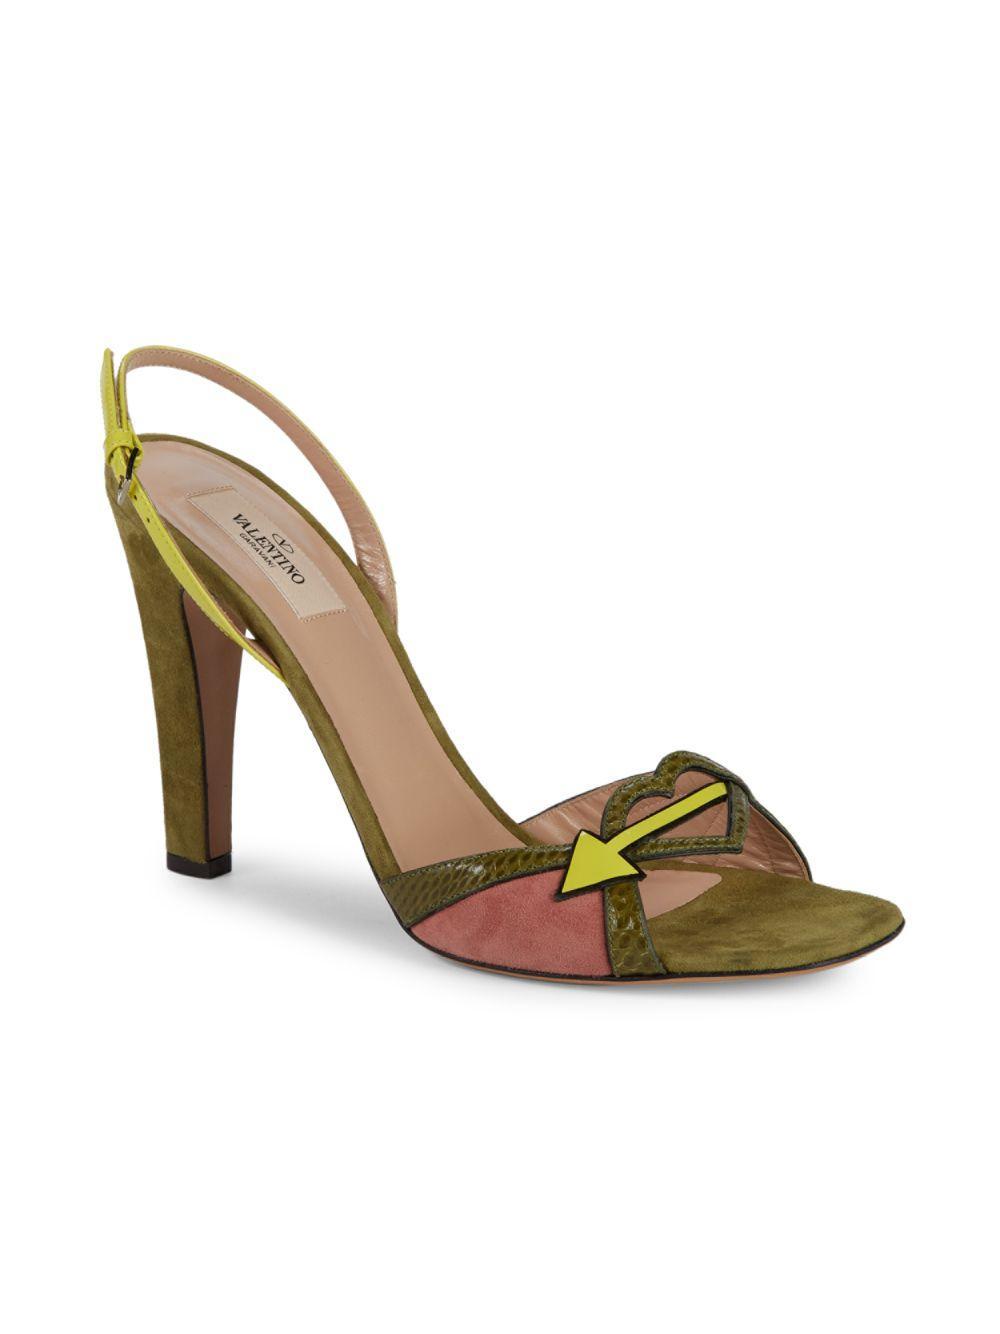 09d5234aad2 Lyst - Valentino Snakeskin-trim Suede Arrow Sandals in Green